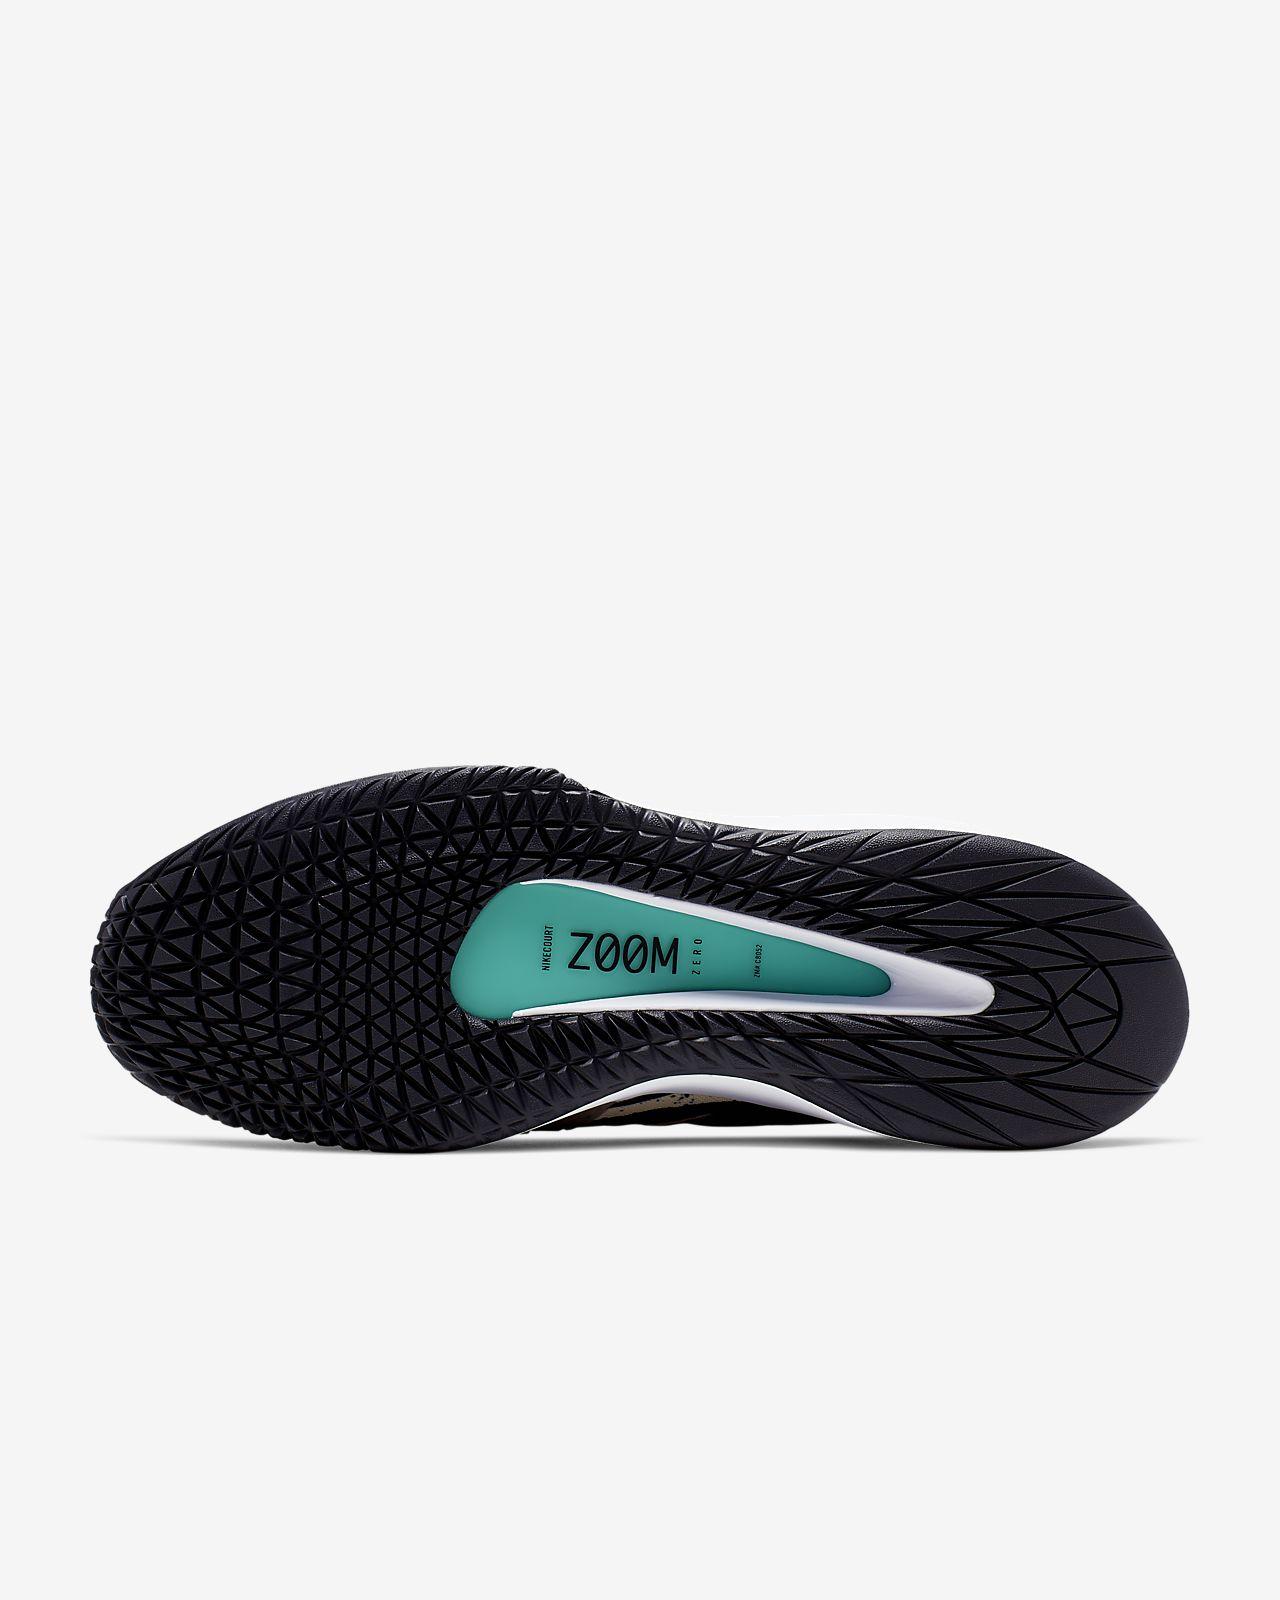 9e6dfa479689f NikeCourt Air Zoom Zero Men's Tennis Shoe. Nike.com